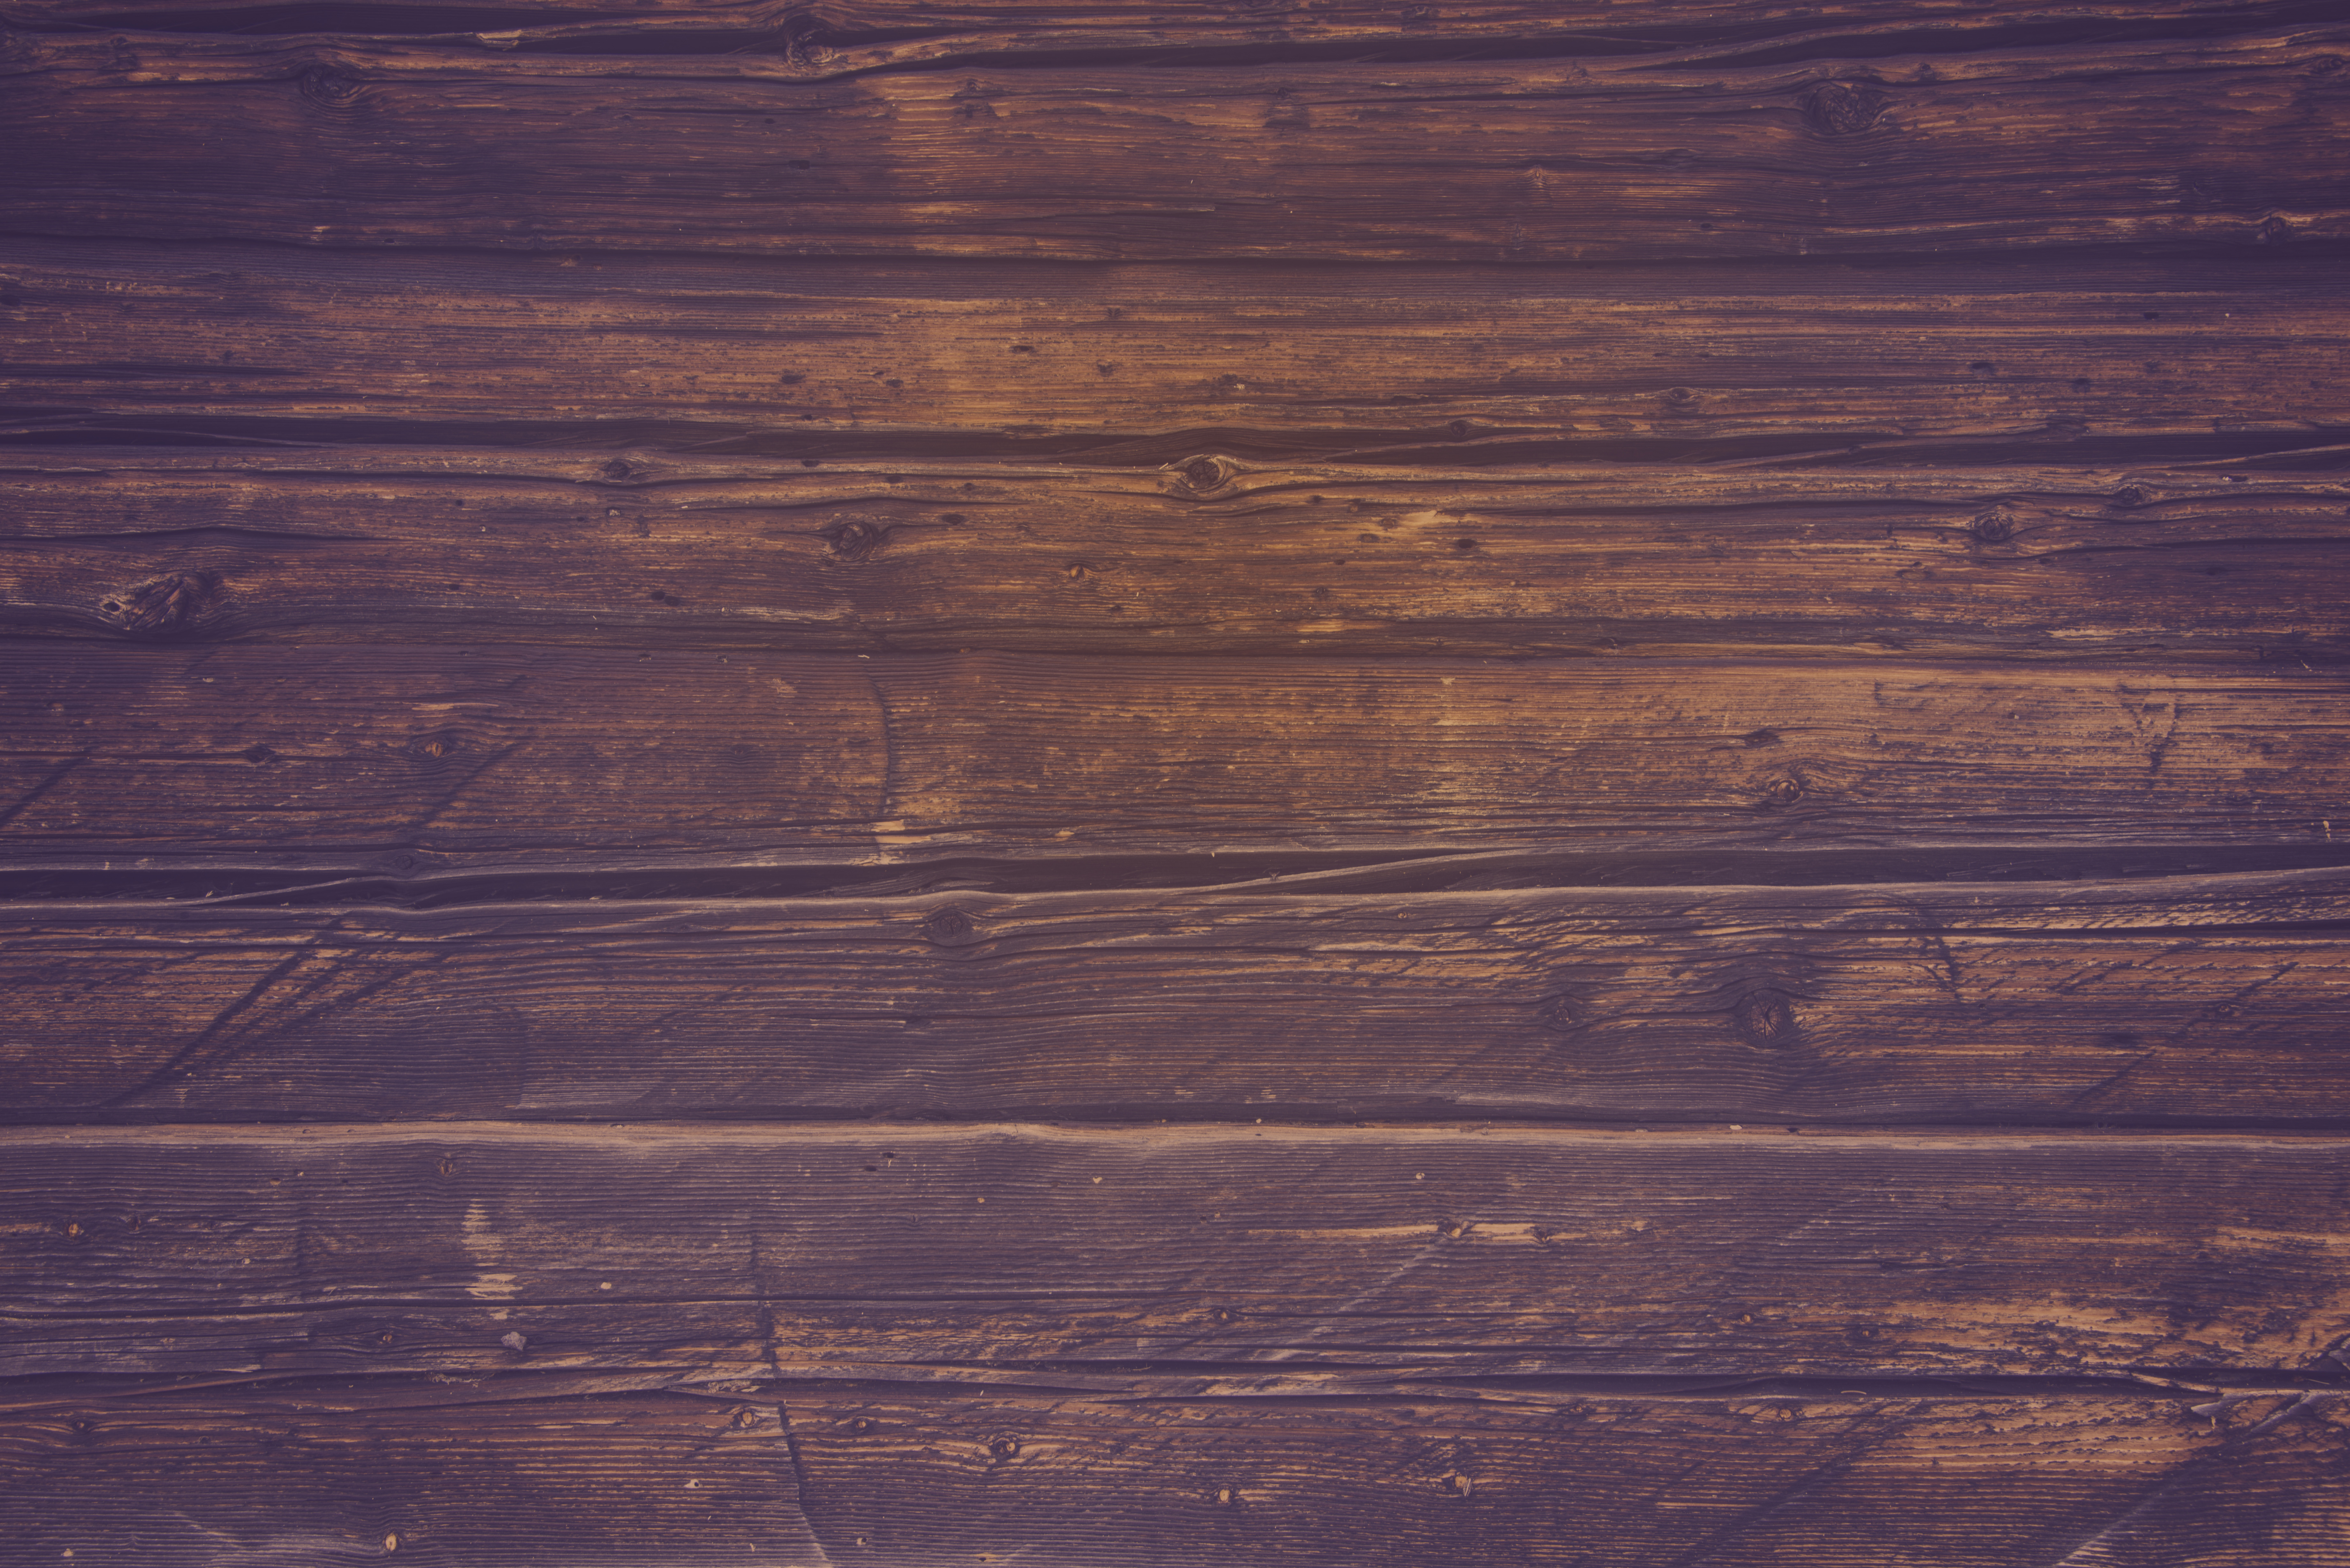 Dreamy Pixel | Free wooden texture - Dreamy Pixel